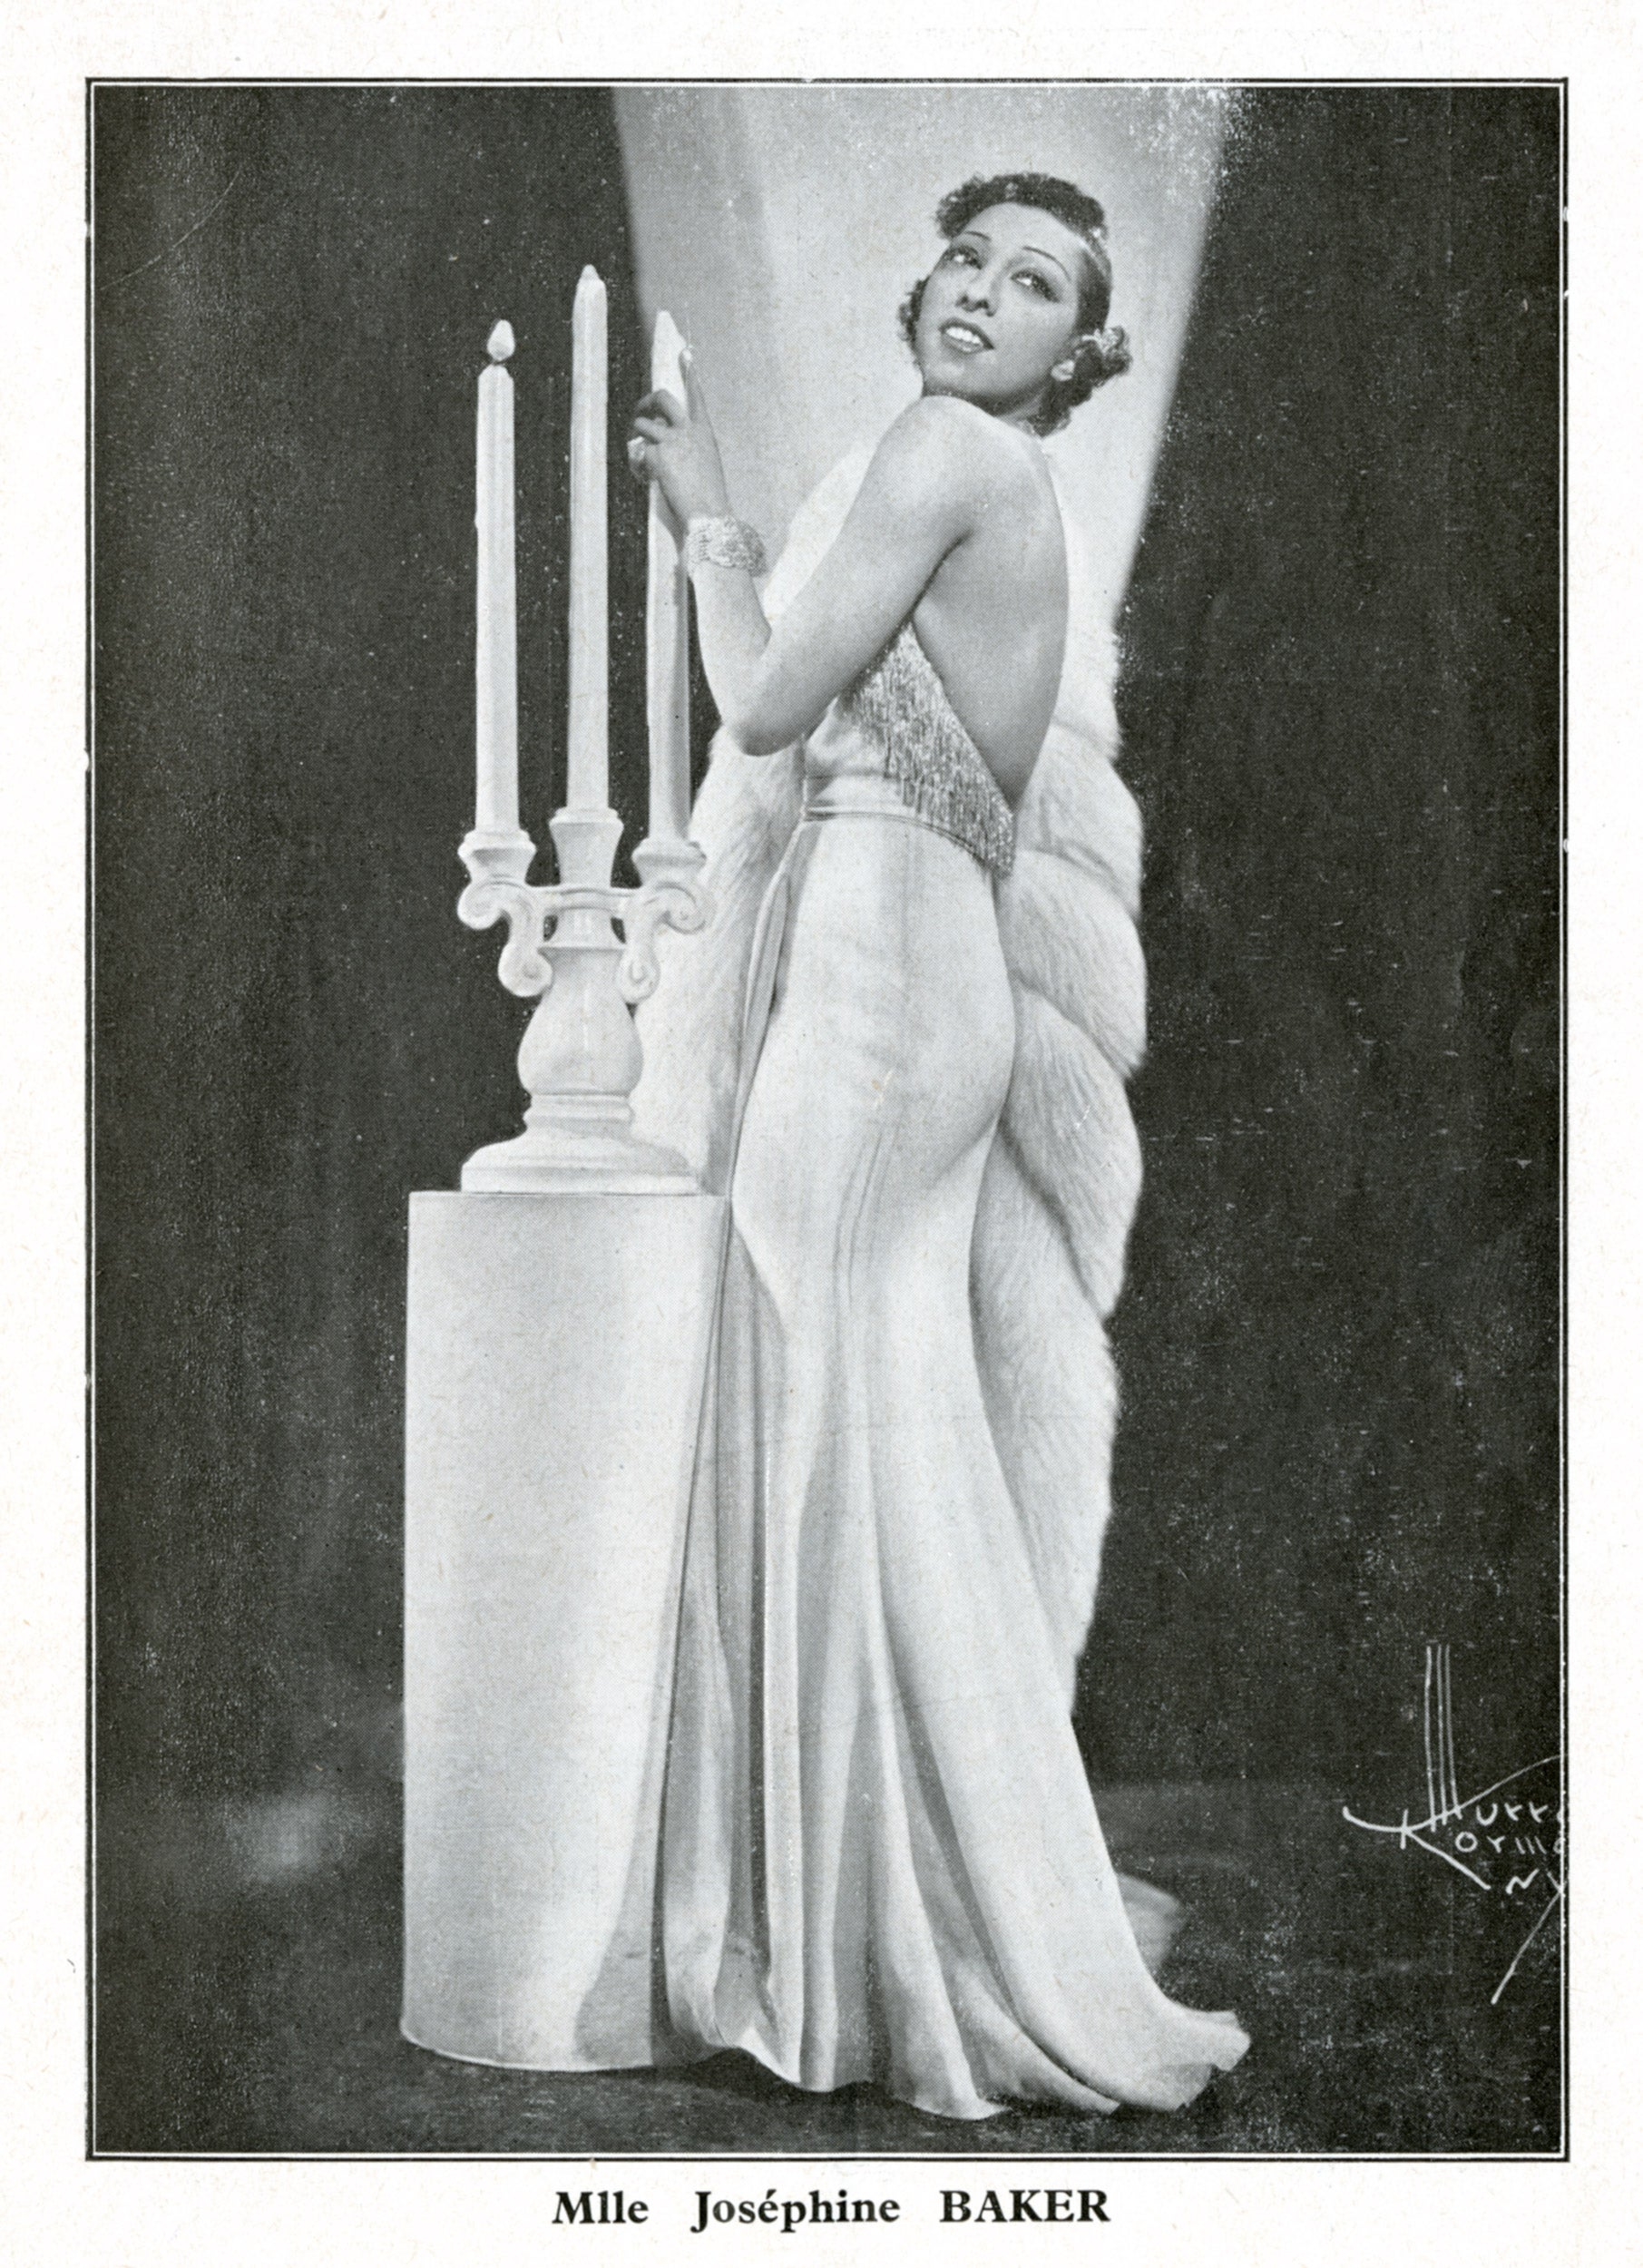 Josephine Baker became an international sensation as a singer and dancer at the Folies Bergère cabaret in Paris.